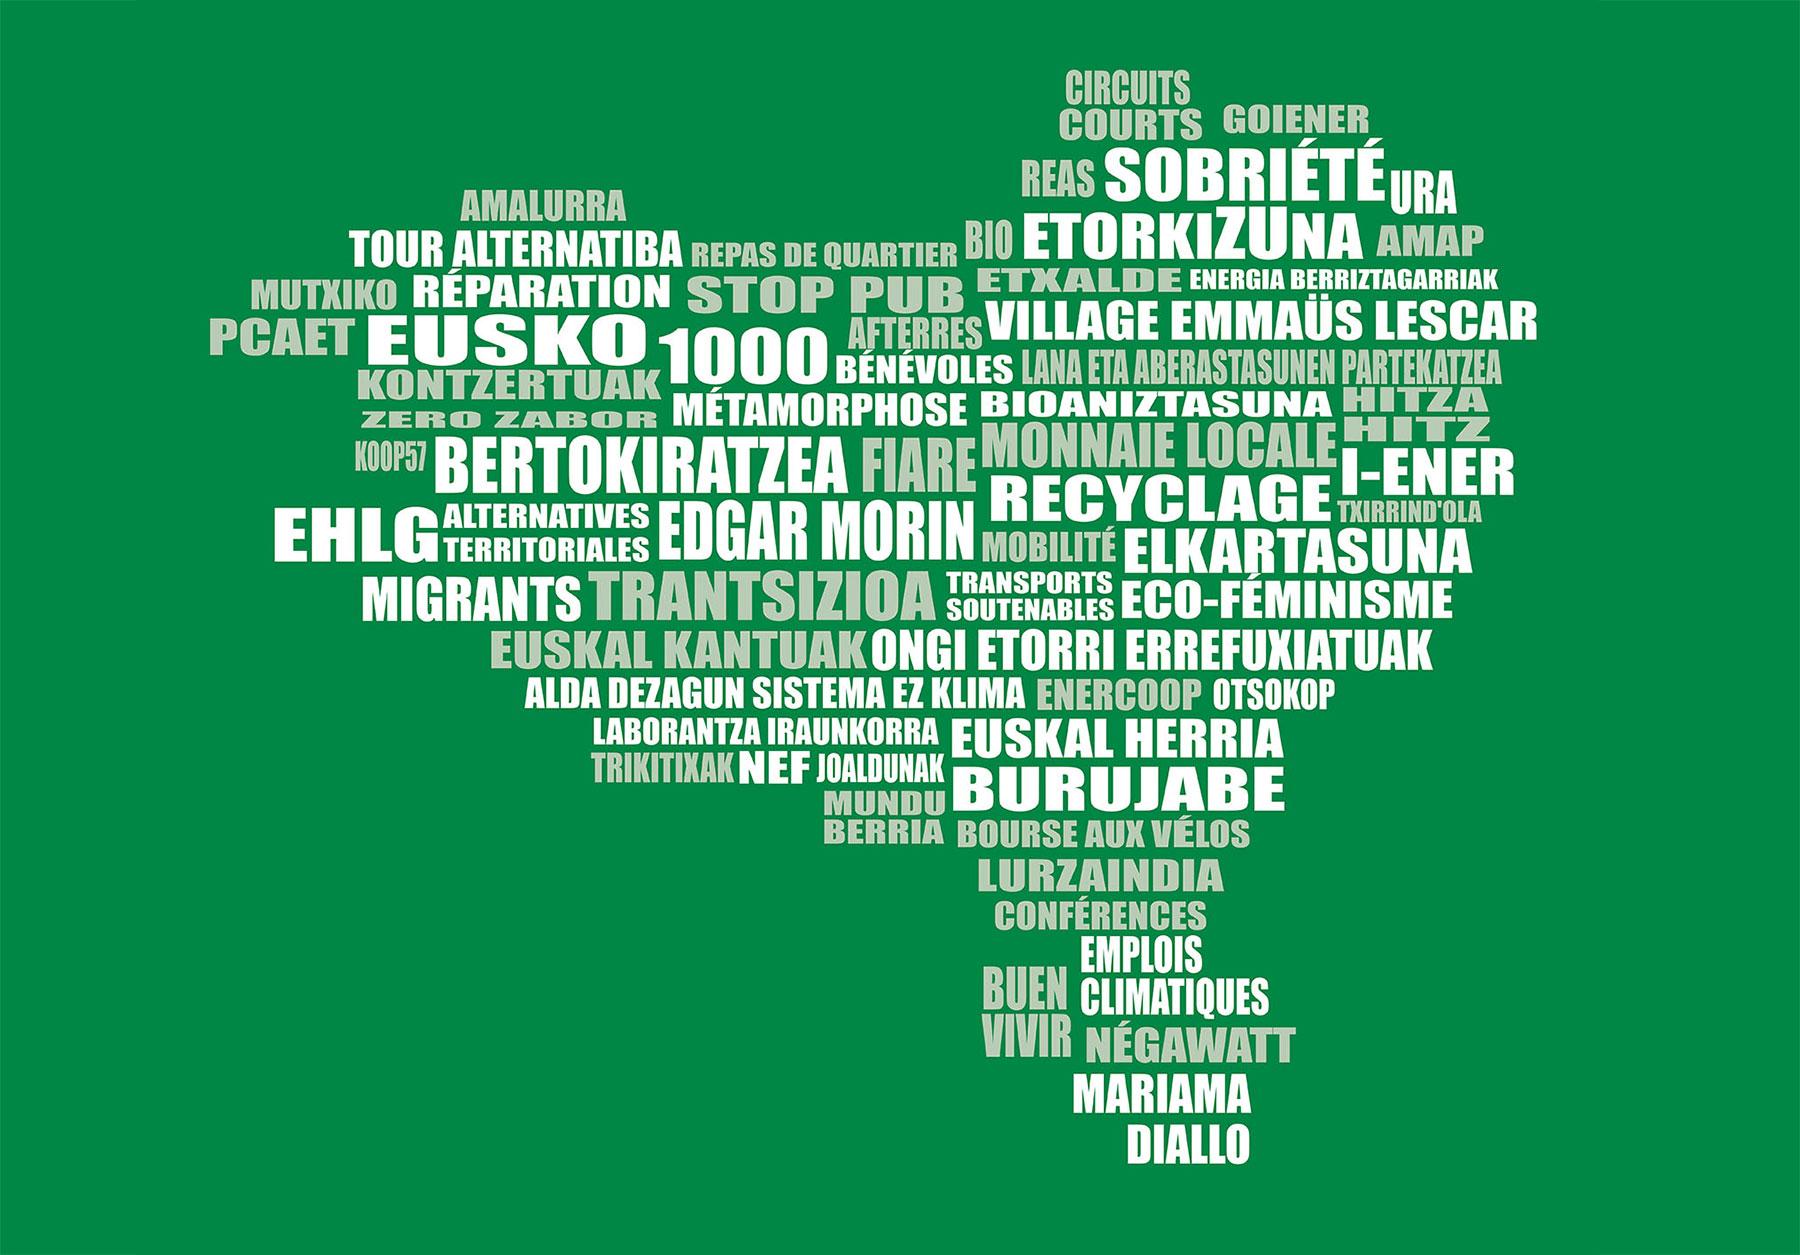 Alternatiba-Euskal-Herri-Burujabe-Pays-Basque